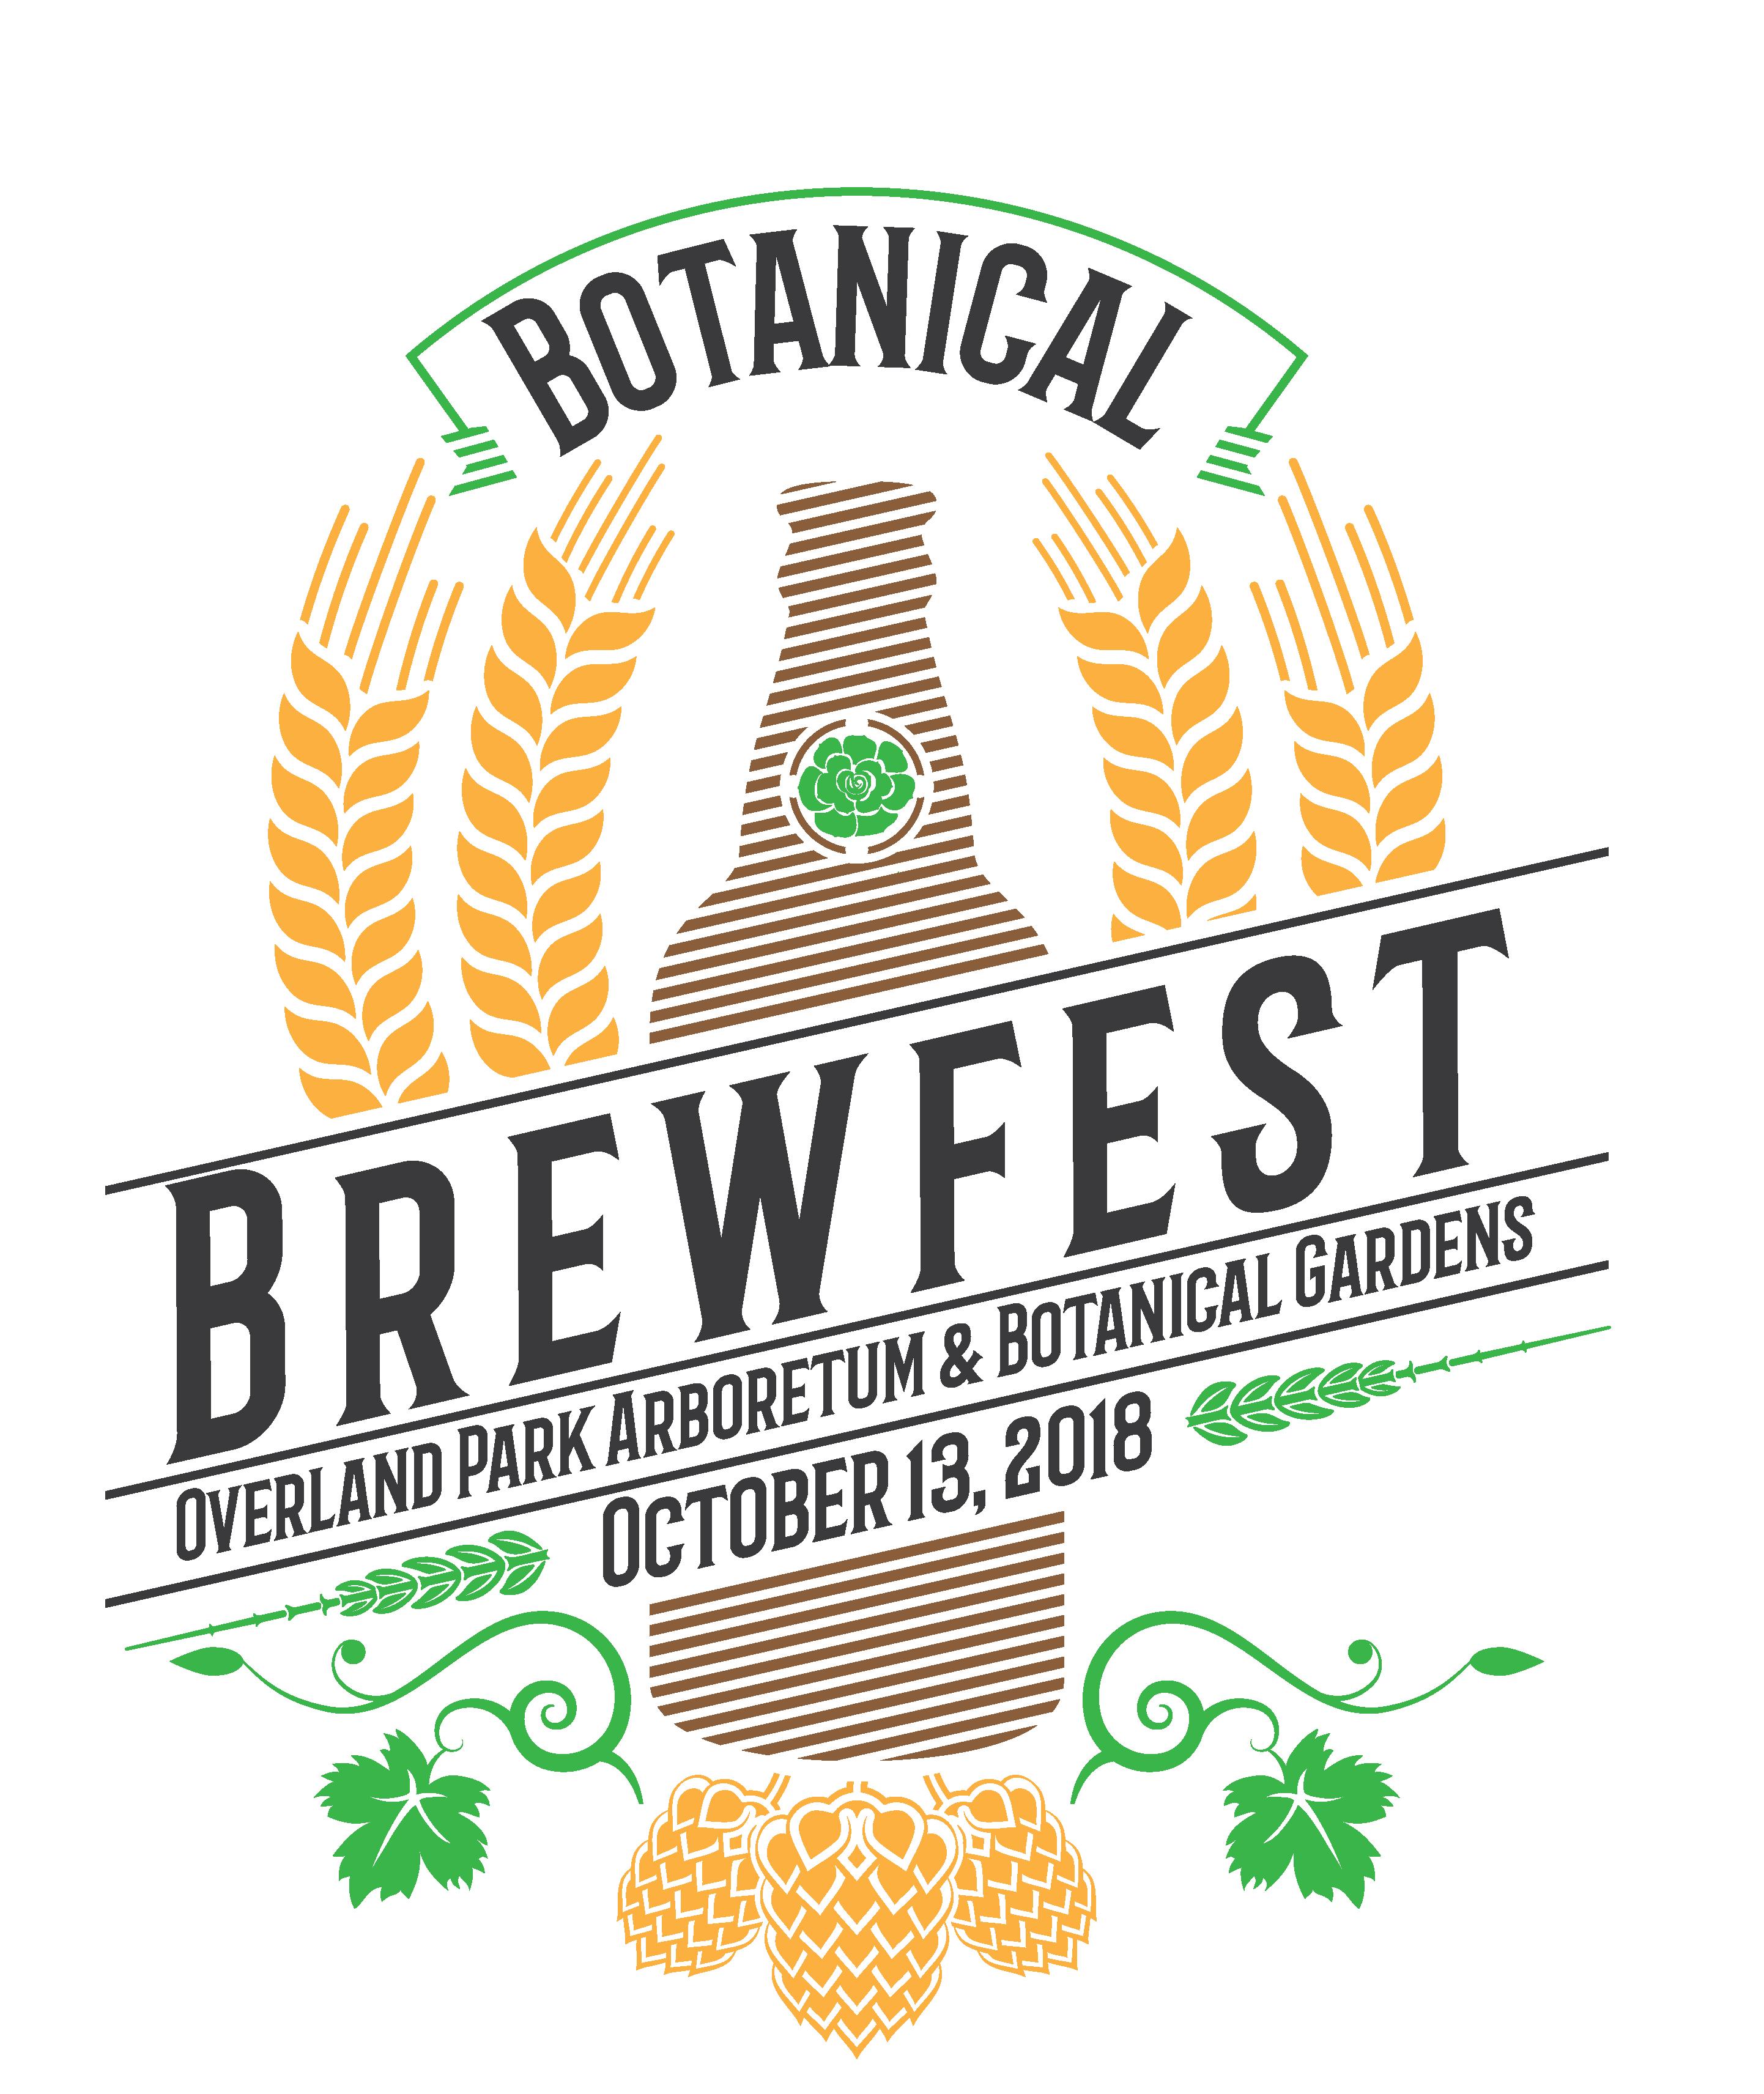 BrewFestLogo V3-01